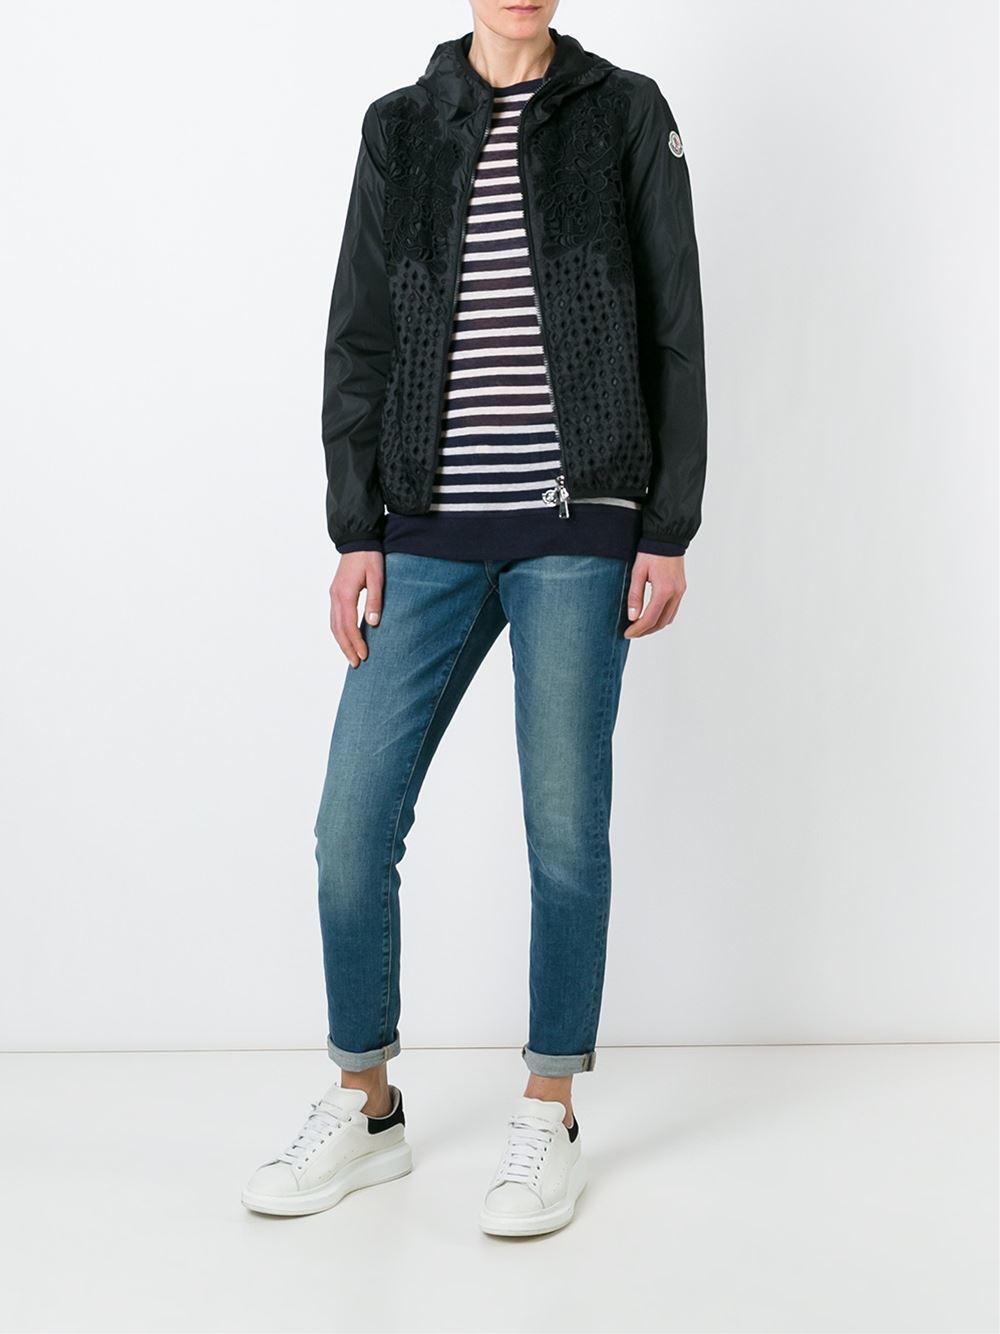 moncler vive jacket black